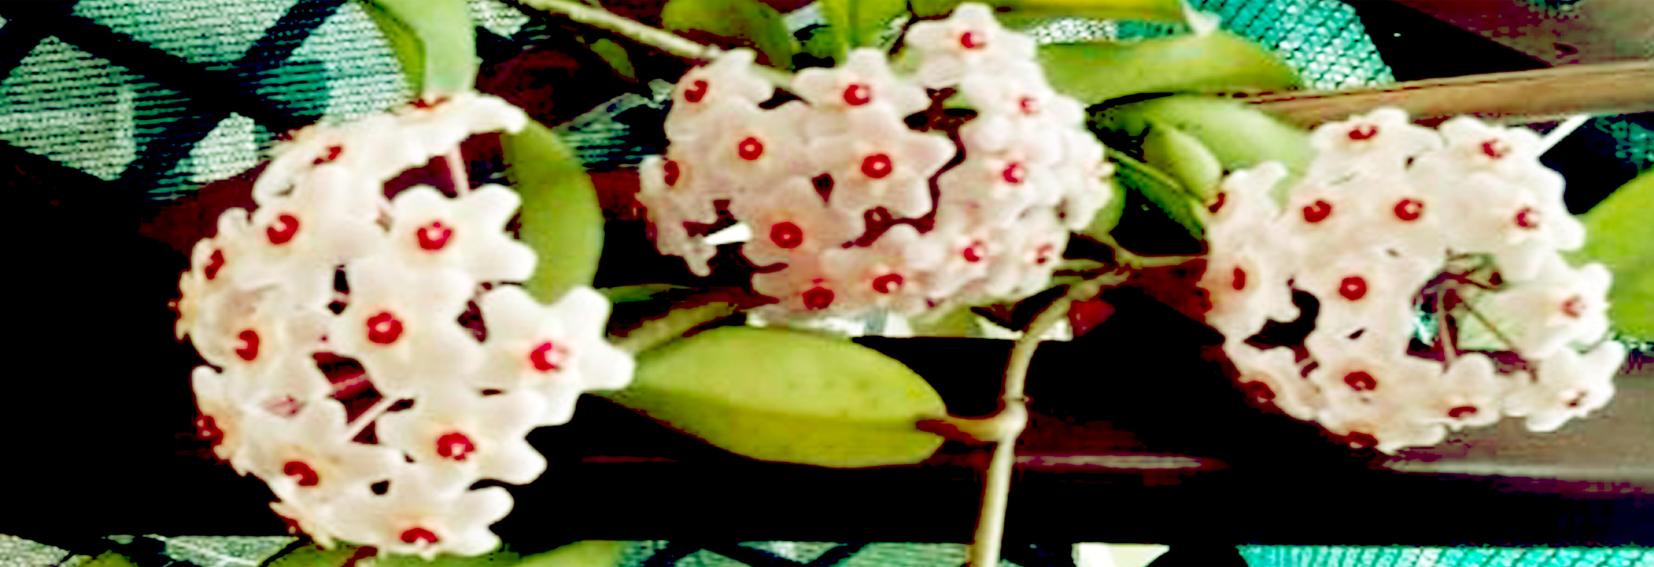 fiore hoya carnosa